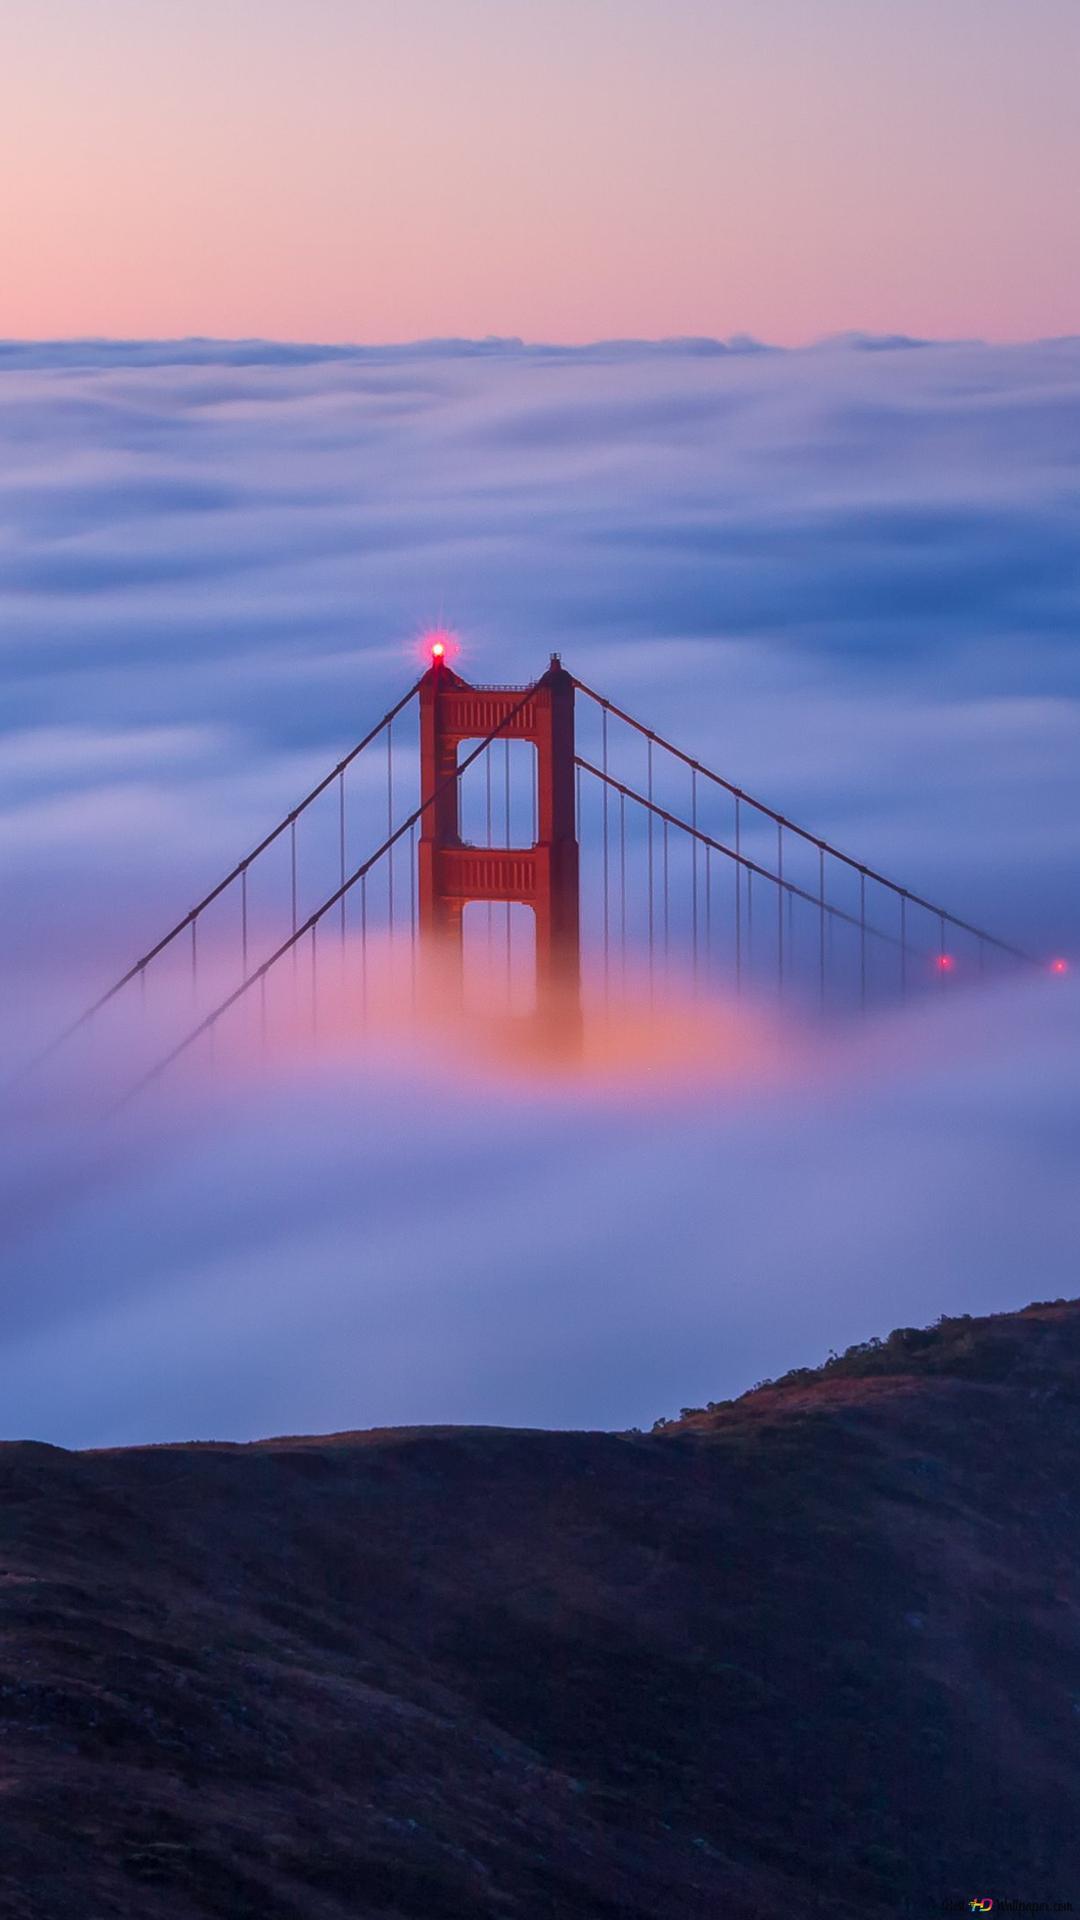 Golden Gate Bridge Over Clouds Hd Wallpaper Download